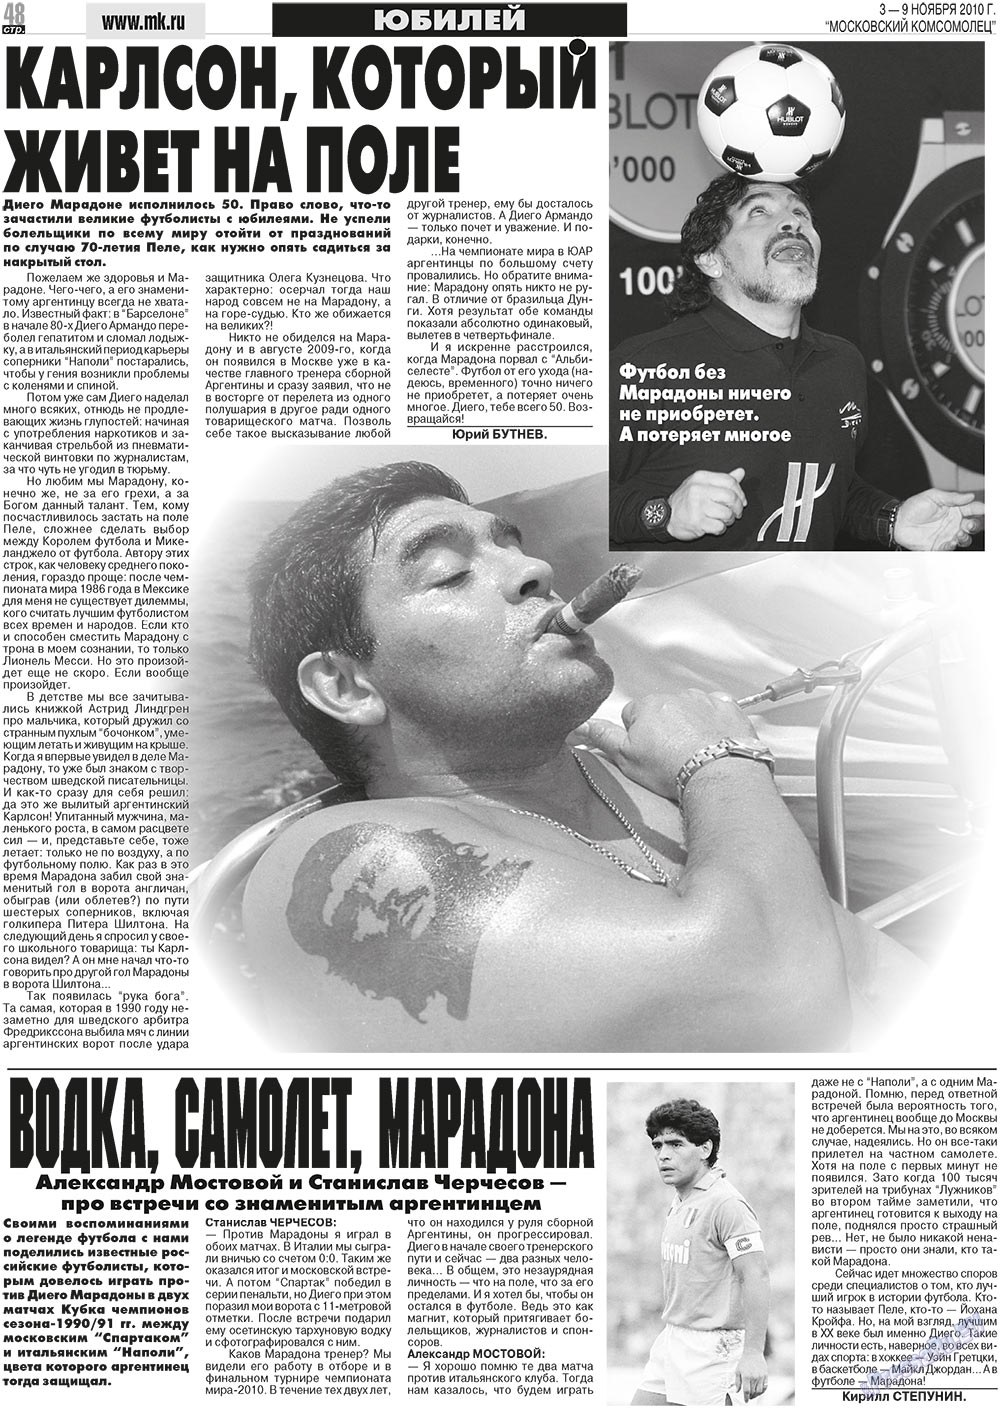 МК Испания (газета). 2010 год, номер 44, стр. 48